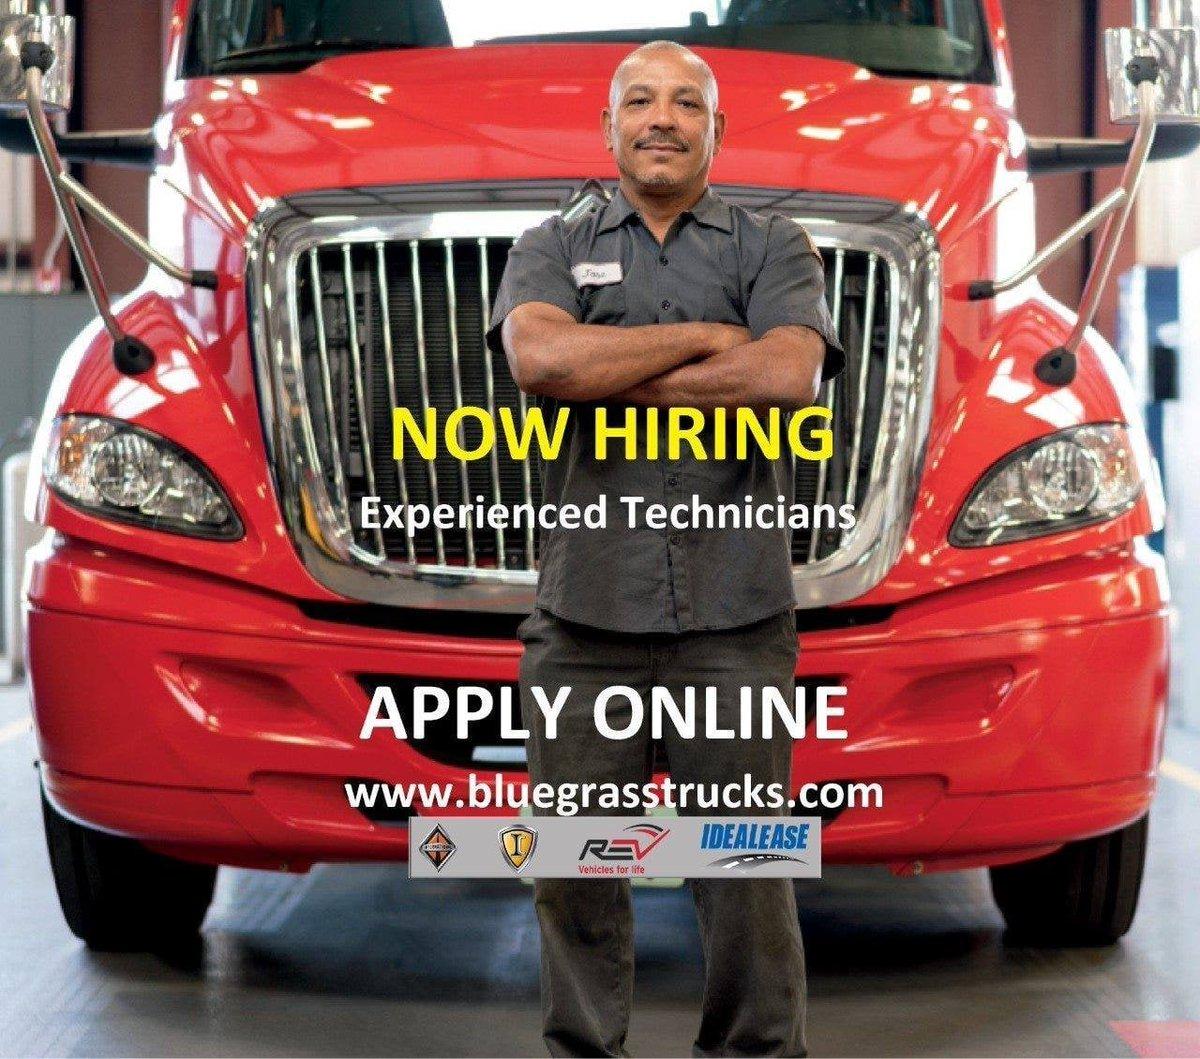 Needing a good job? We're looking for you! #DieselTechicians #internationaltrucks #jobseekers #job #jobsearch #career #careeropportunities #careeropportunity #techicians #tech #itsuptime